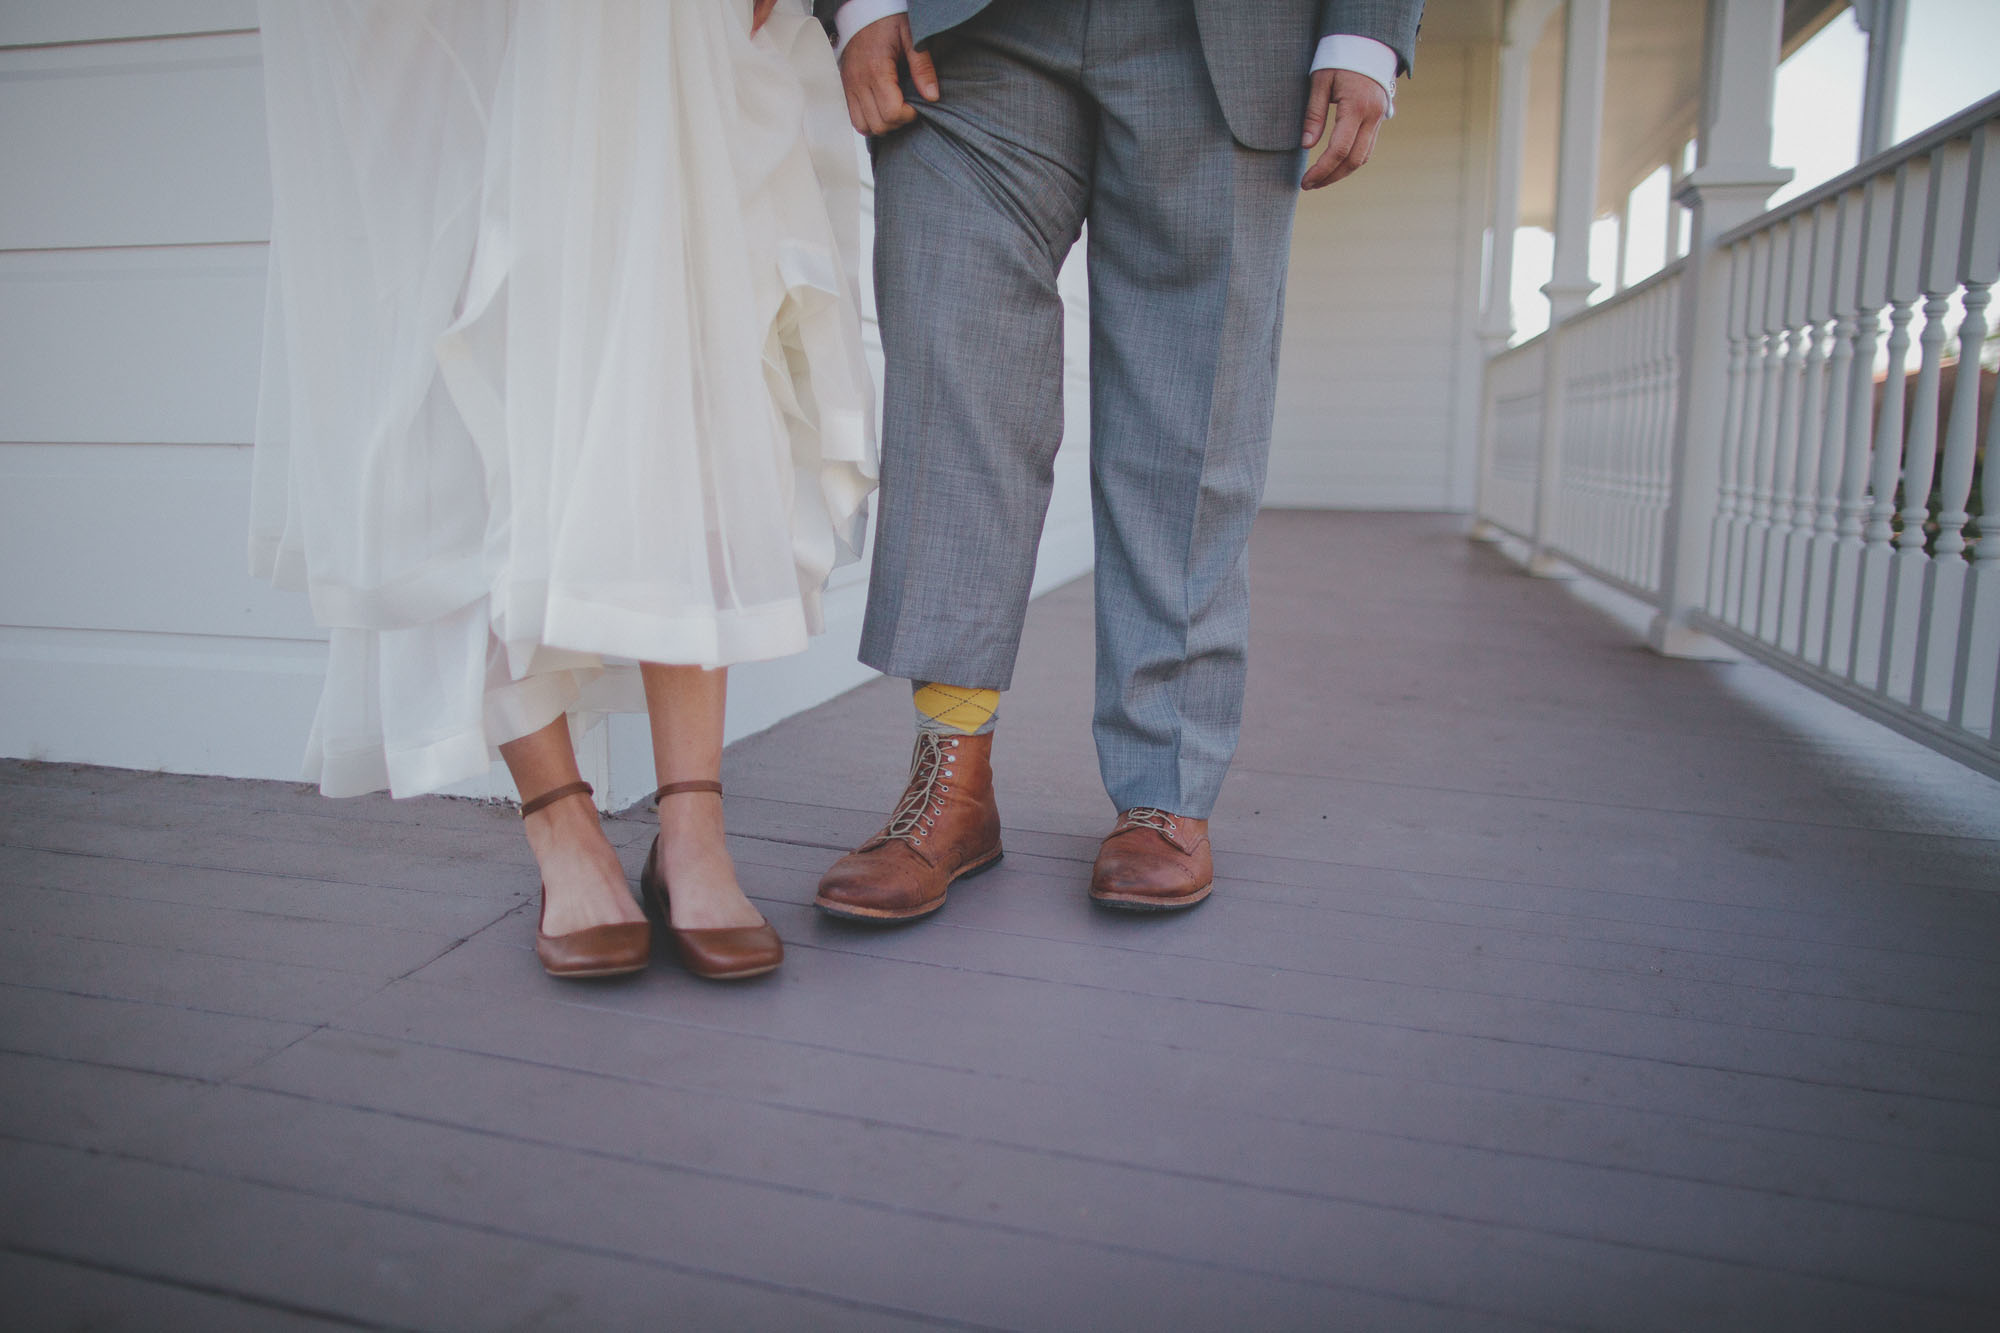 Gretchen_Gause_Petaluma_Olympias_Valley_Wedding_Photo-094.jpg